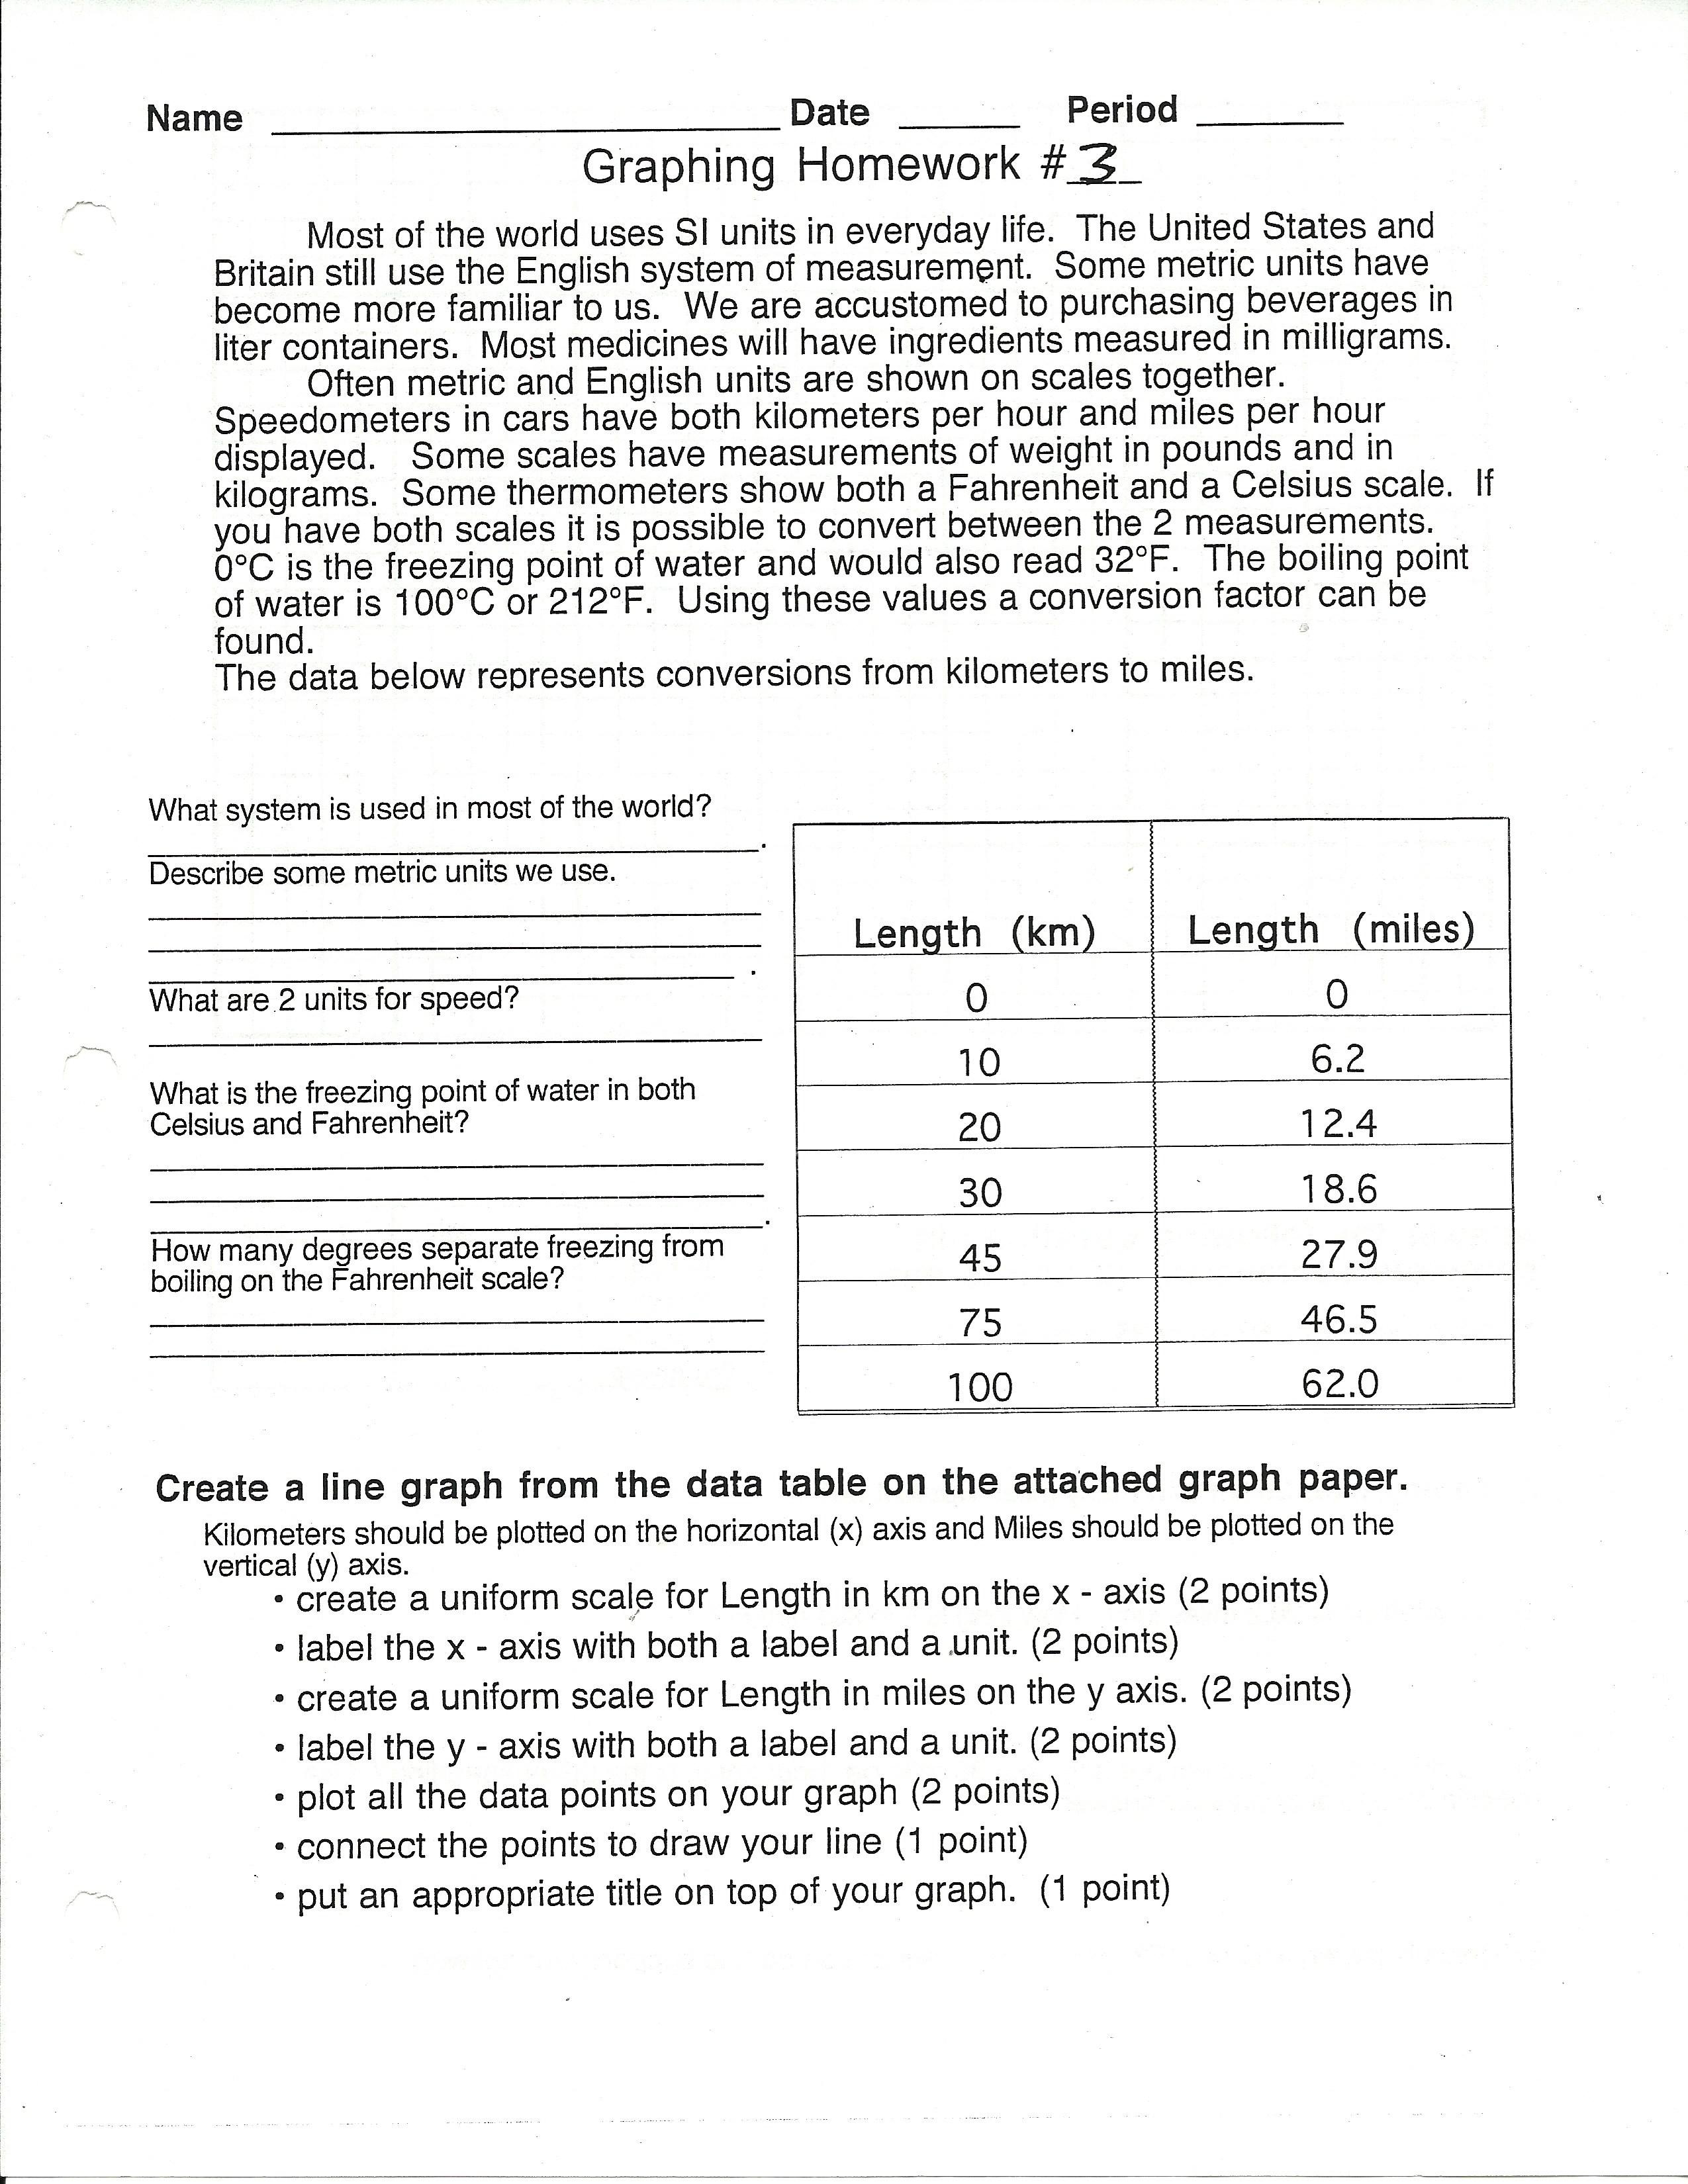 worksheet Velocity And Acceleration Calculation Worksheet Answers alvarado intermediate school due wednesday september 17